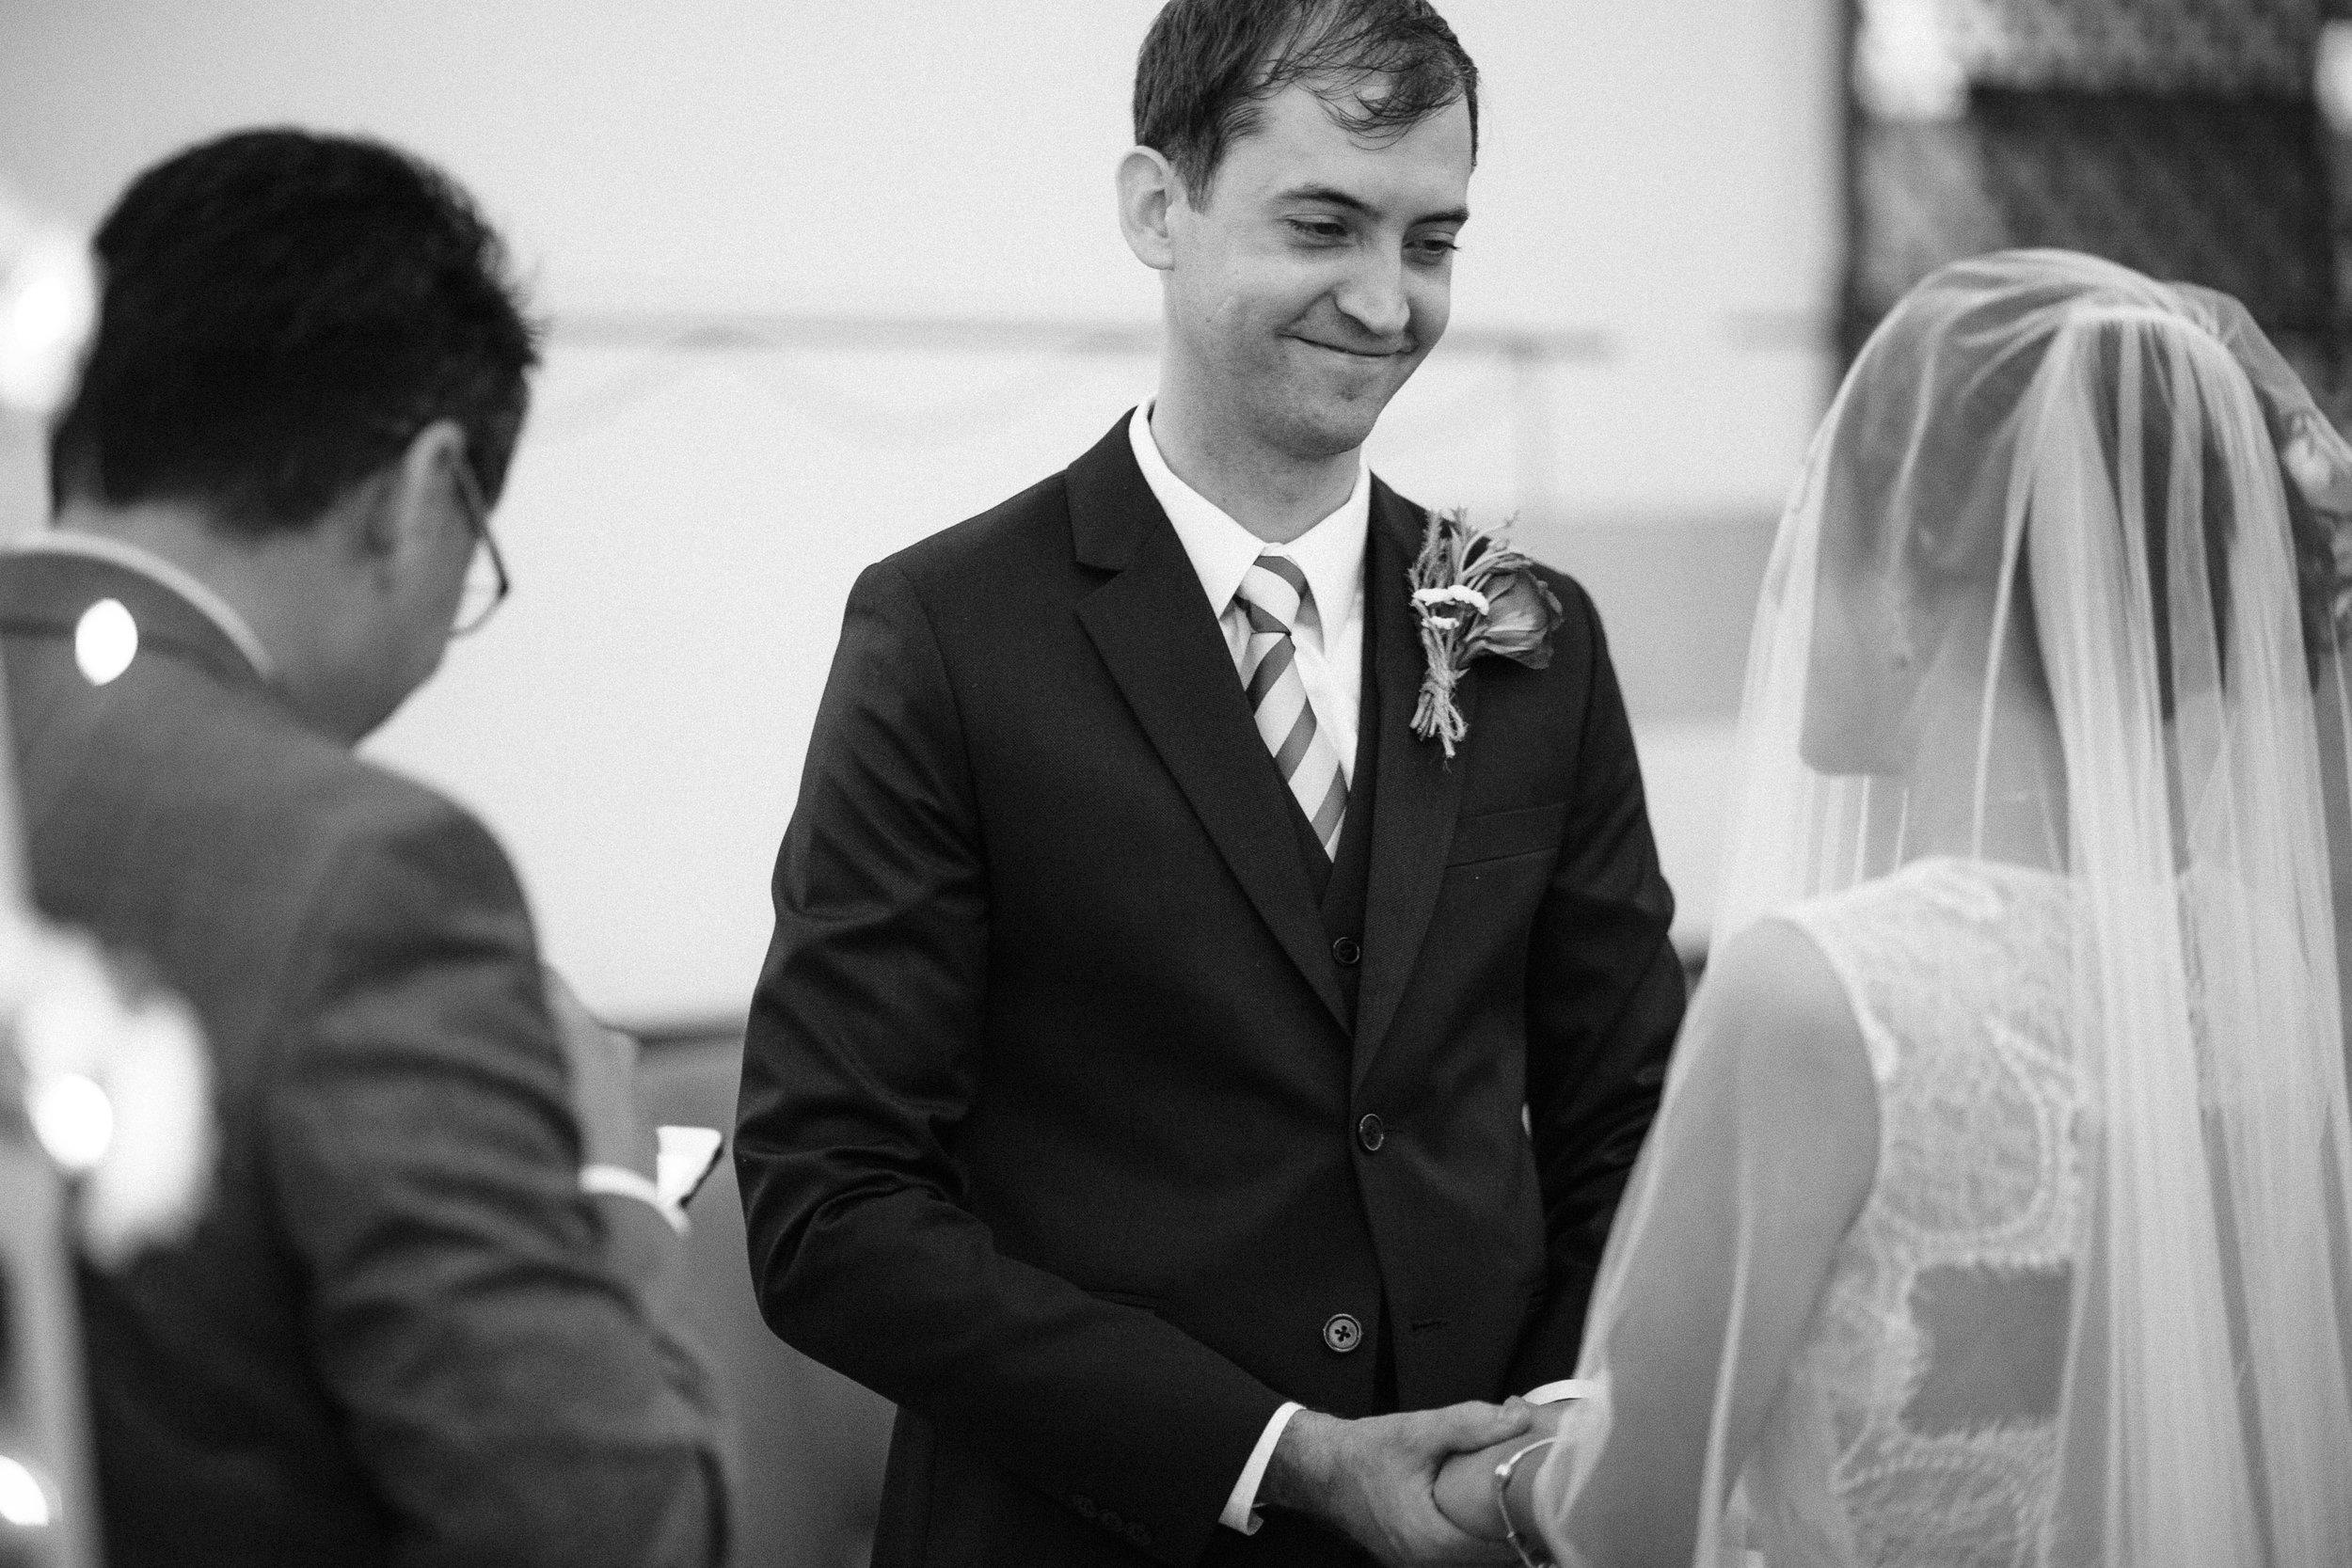 singapore-wedding-photographer-hiram-joyce-040.jpg